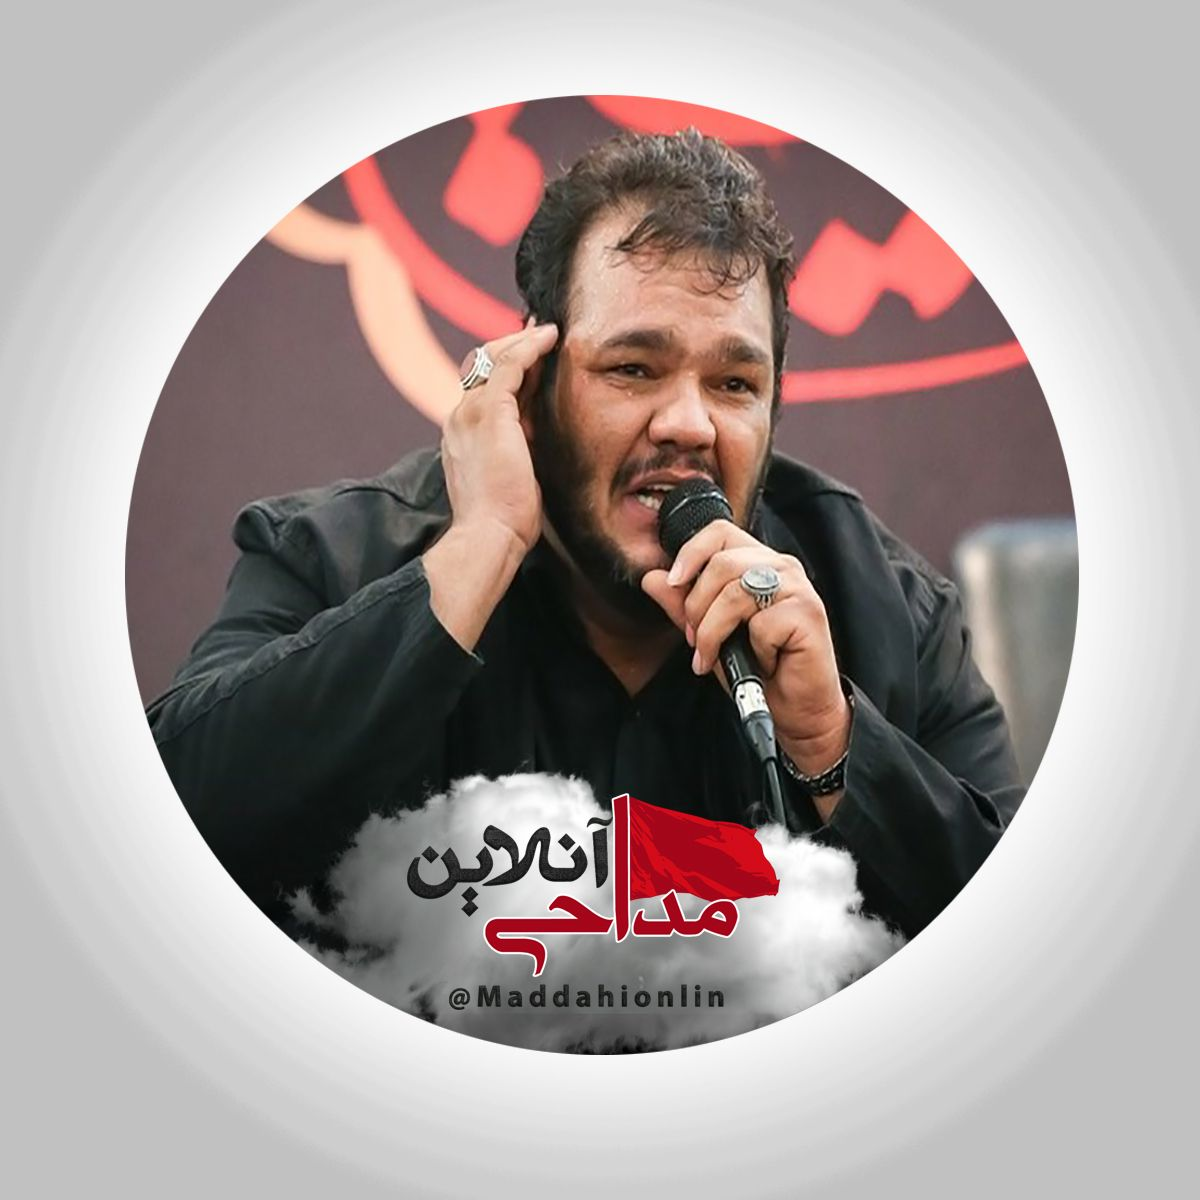 حاج حیدر خمسه